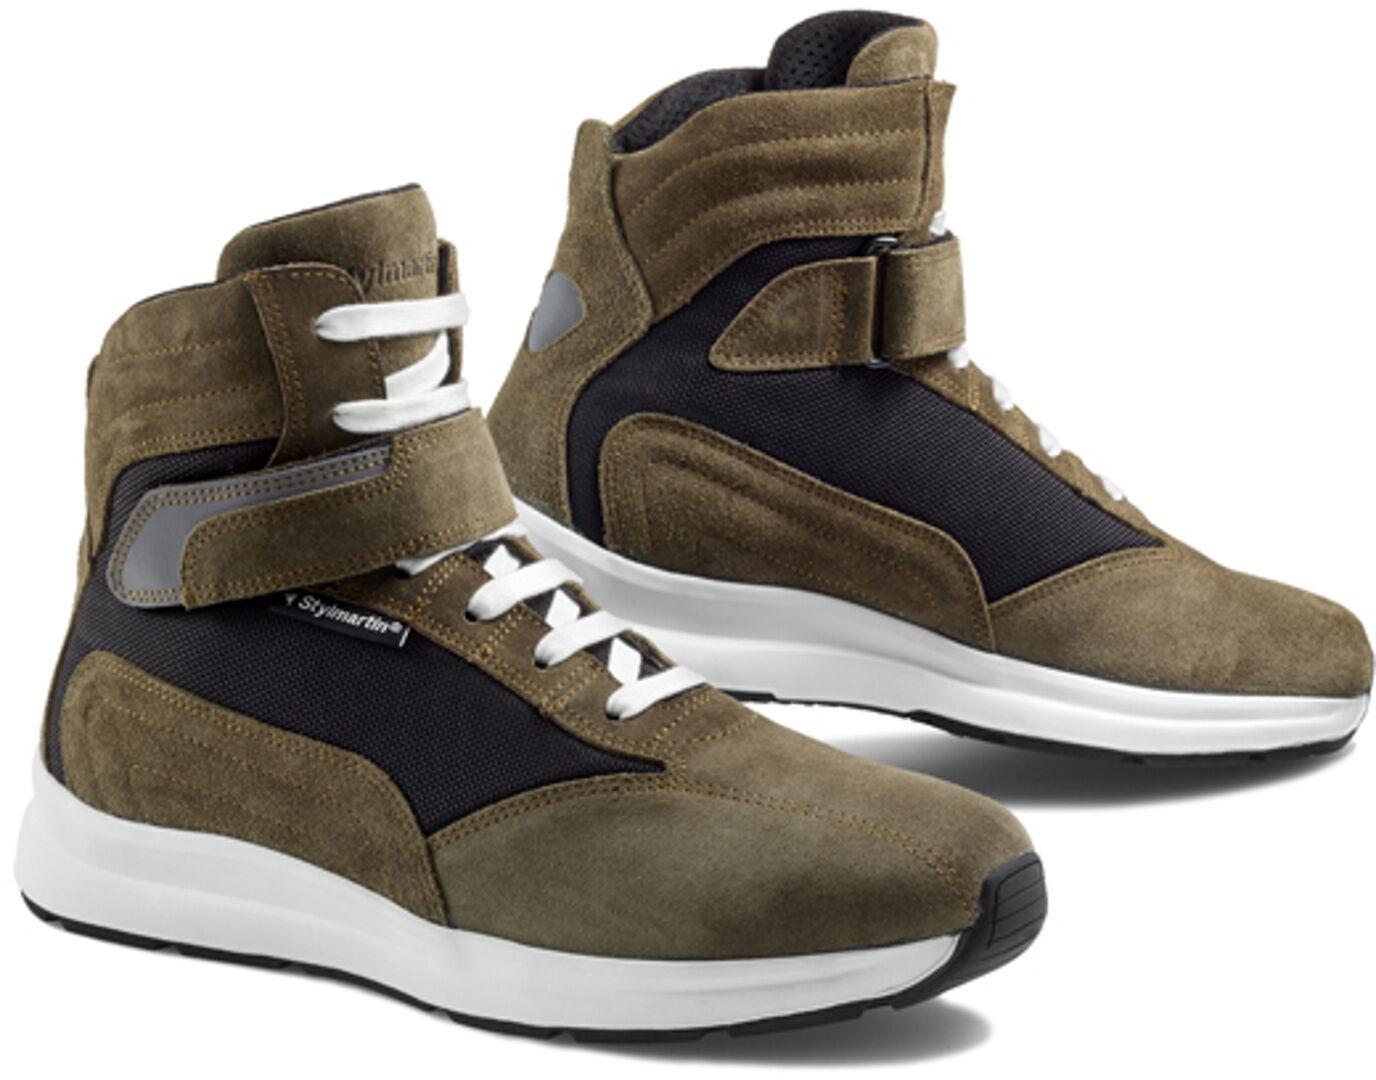 Stylmartin Audax Chaussures de moto Noir Vert taille : 44